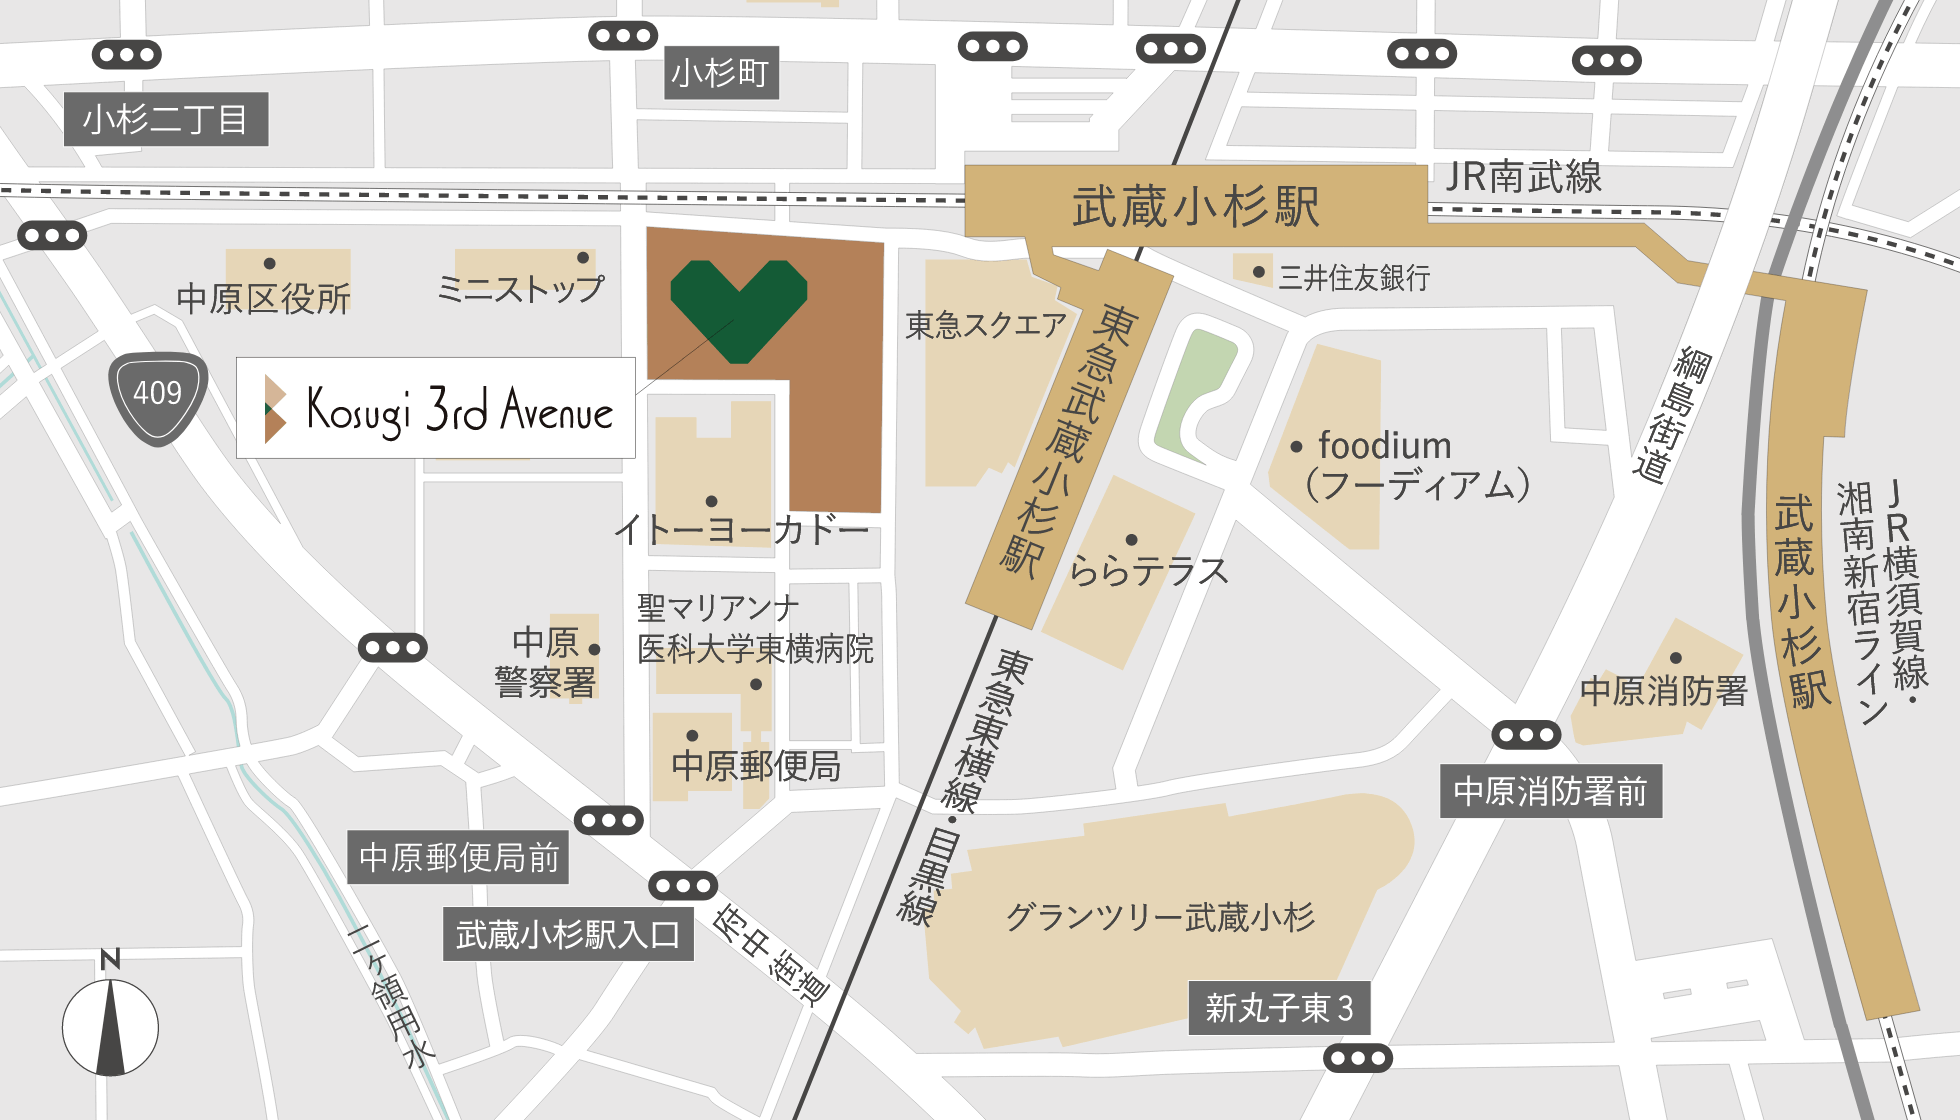 JR線「武蔵小杉」駅徒歩1分、東急東横線・目黒線「武蔵小杉」駅徒歩2分